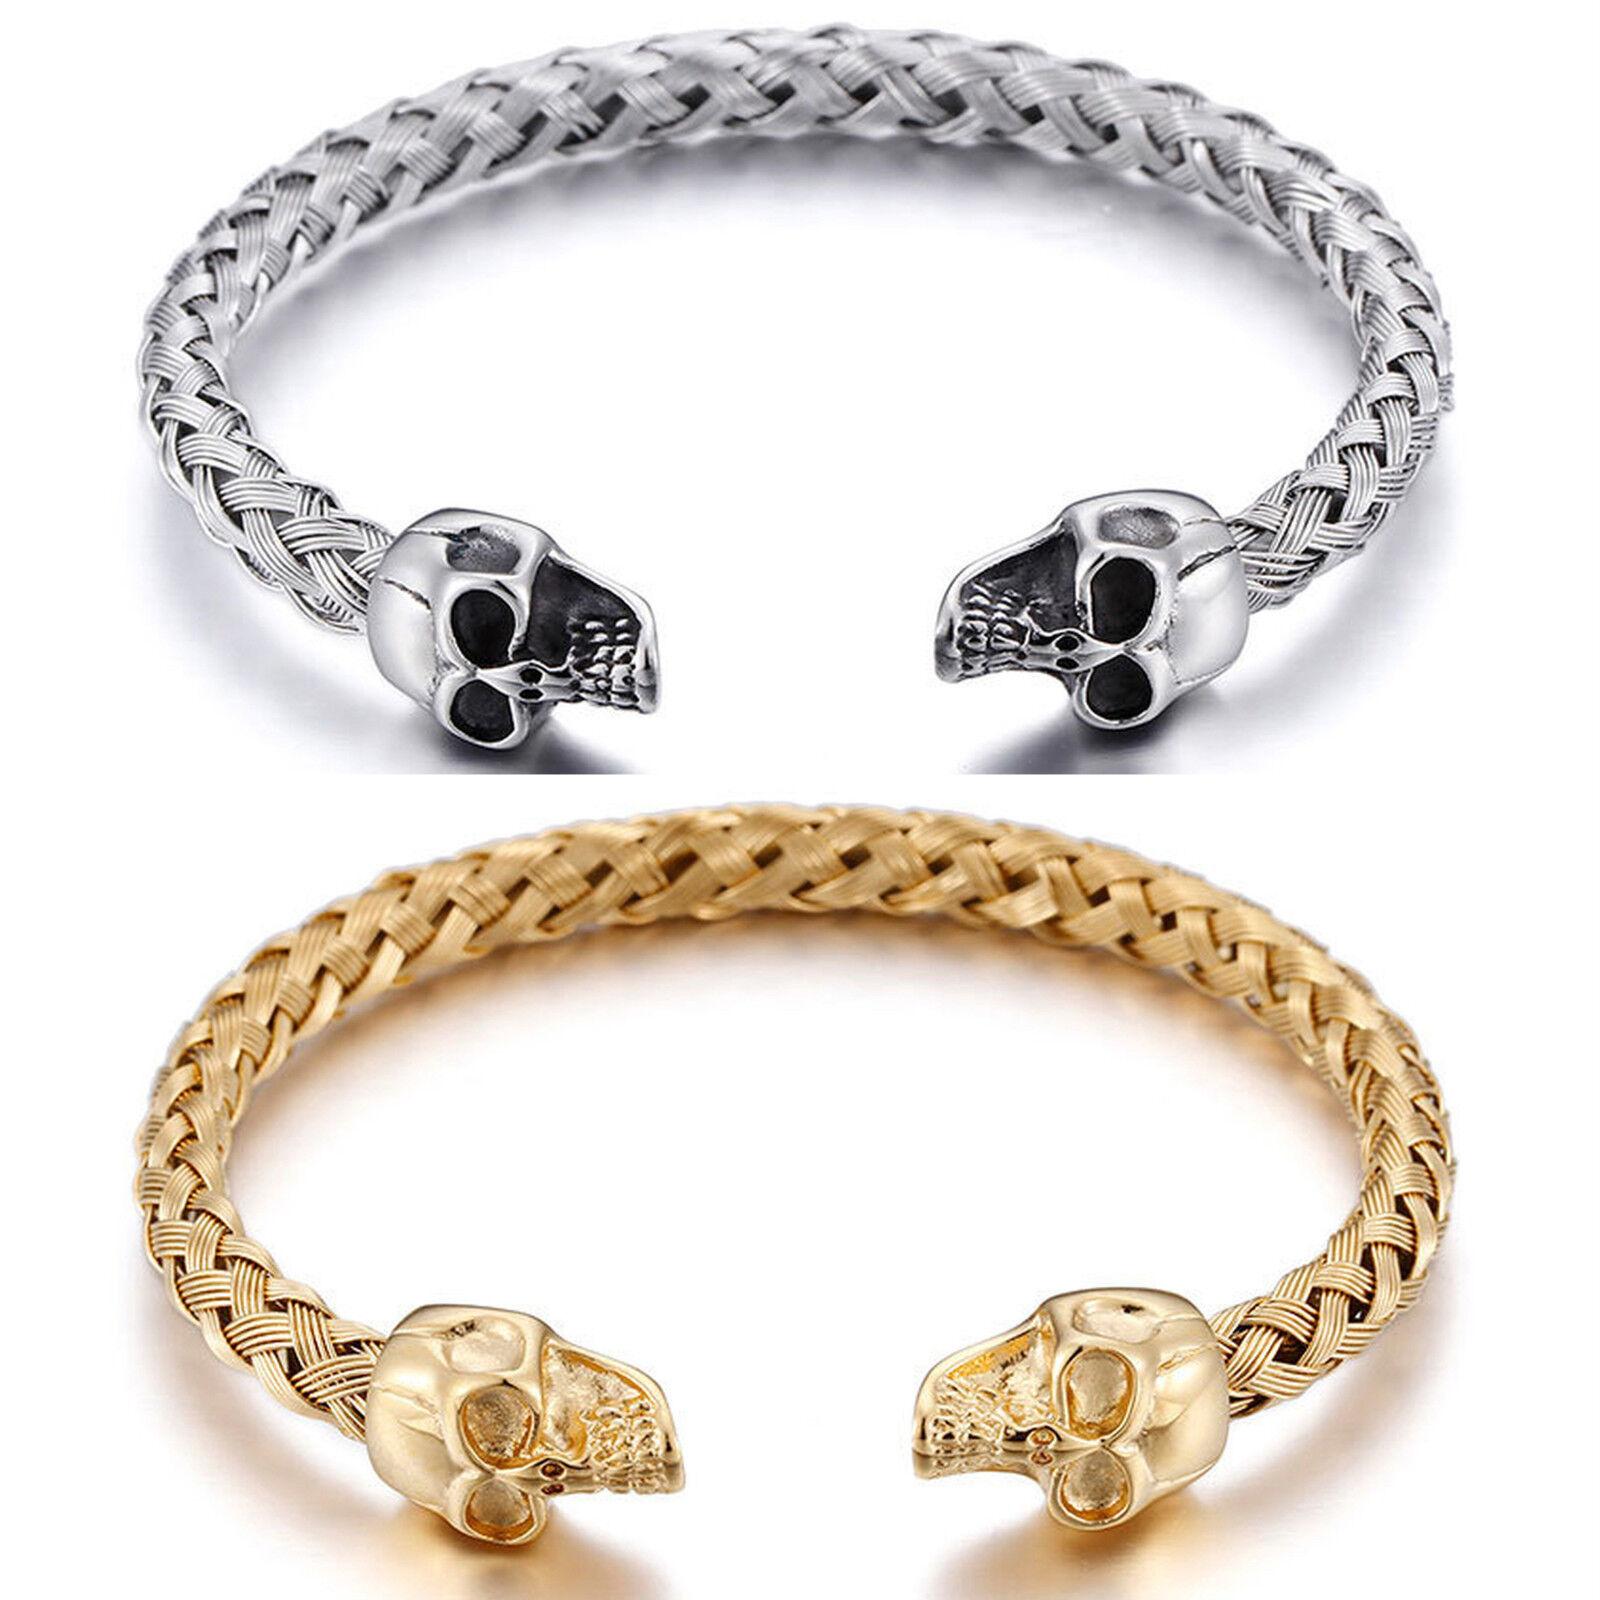 Men's Stainless Steel Gothic Skull Bangle Bracelet (Silver or Gold Color) Bracelets